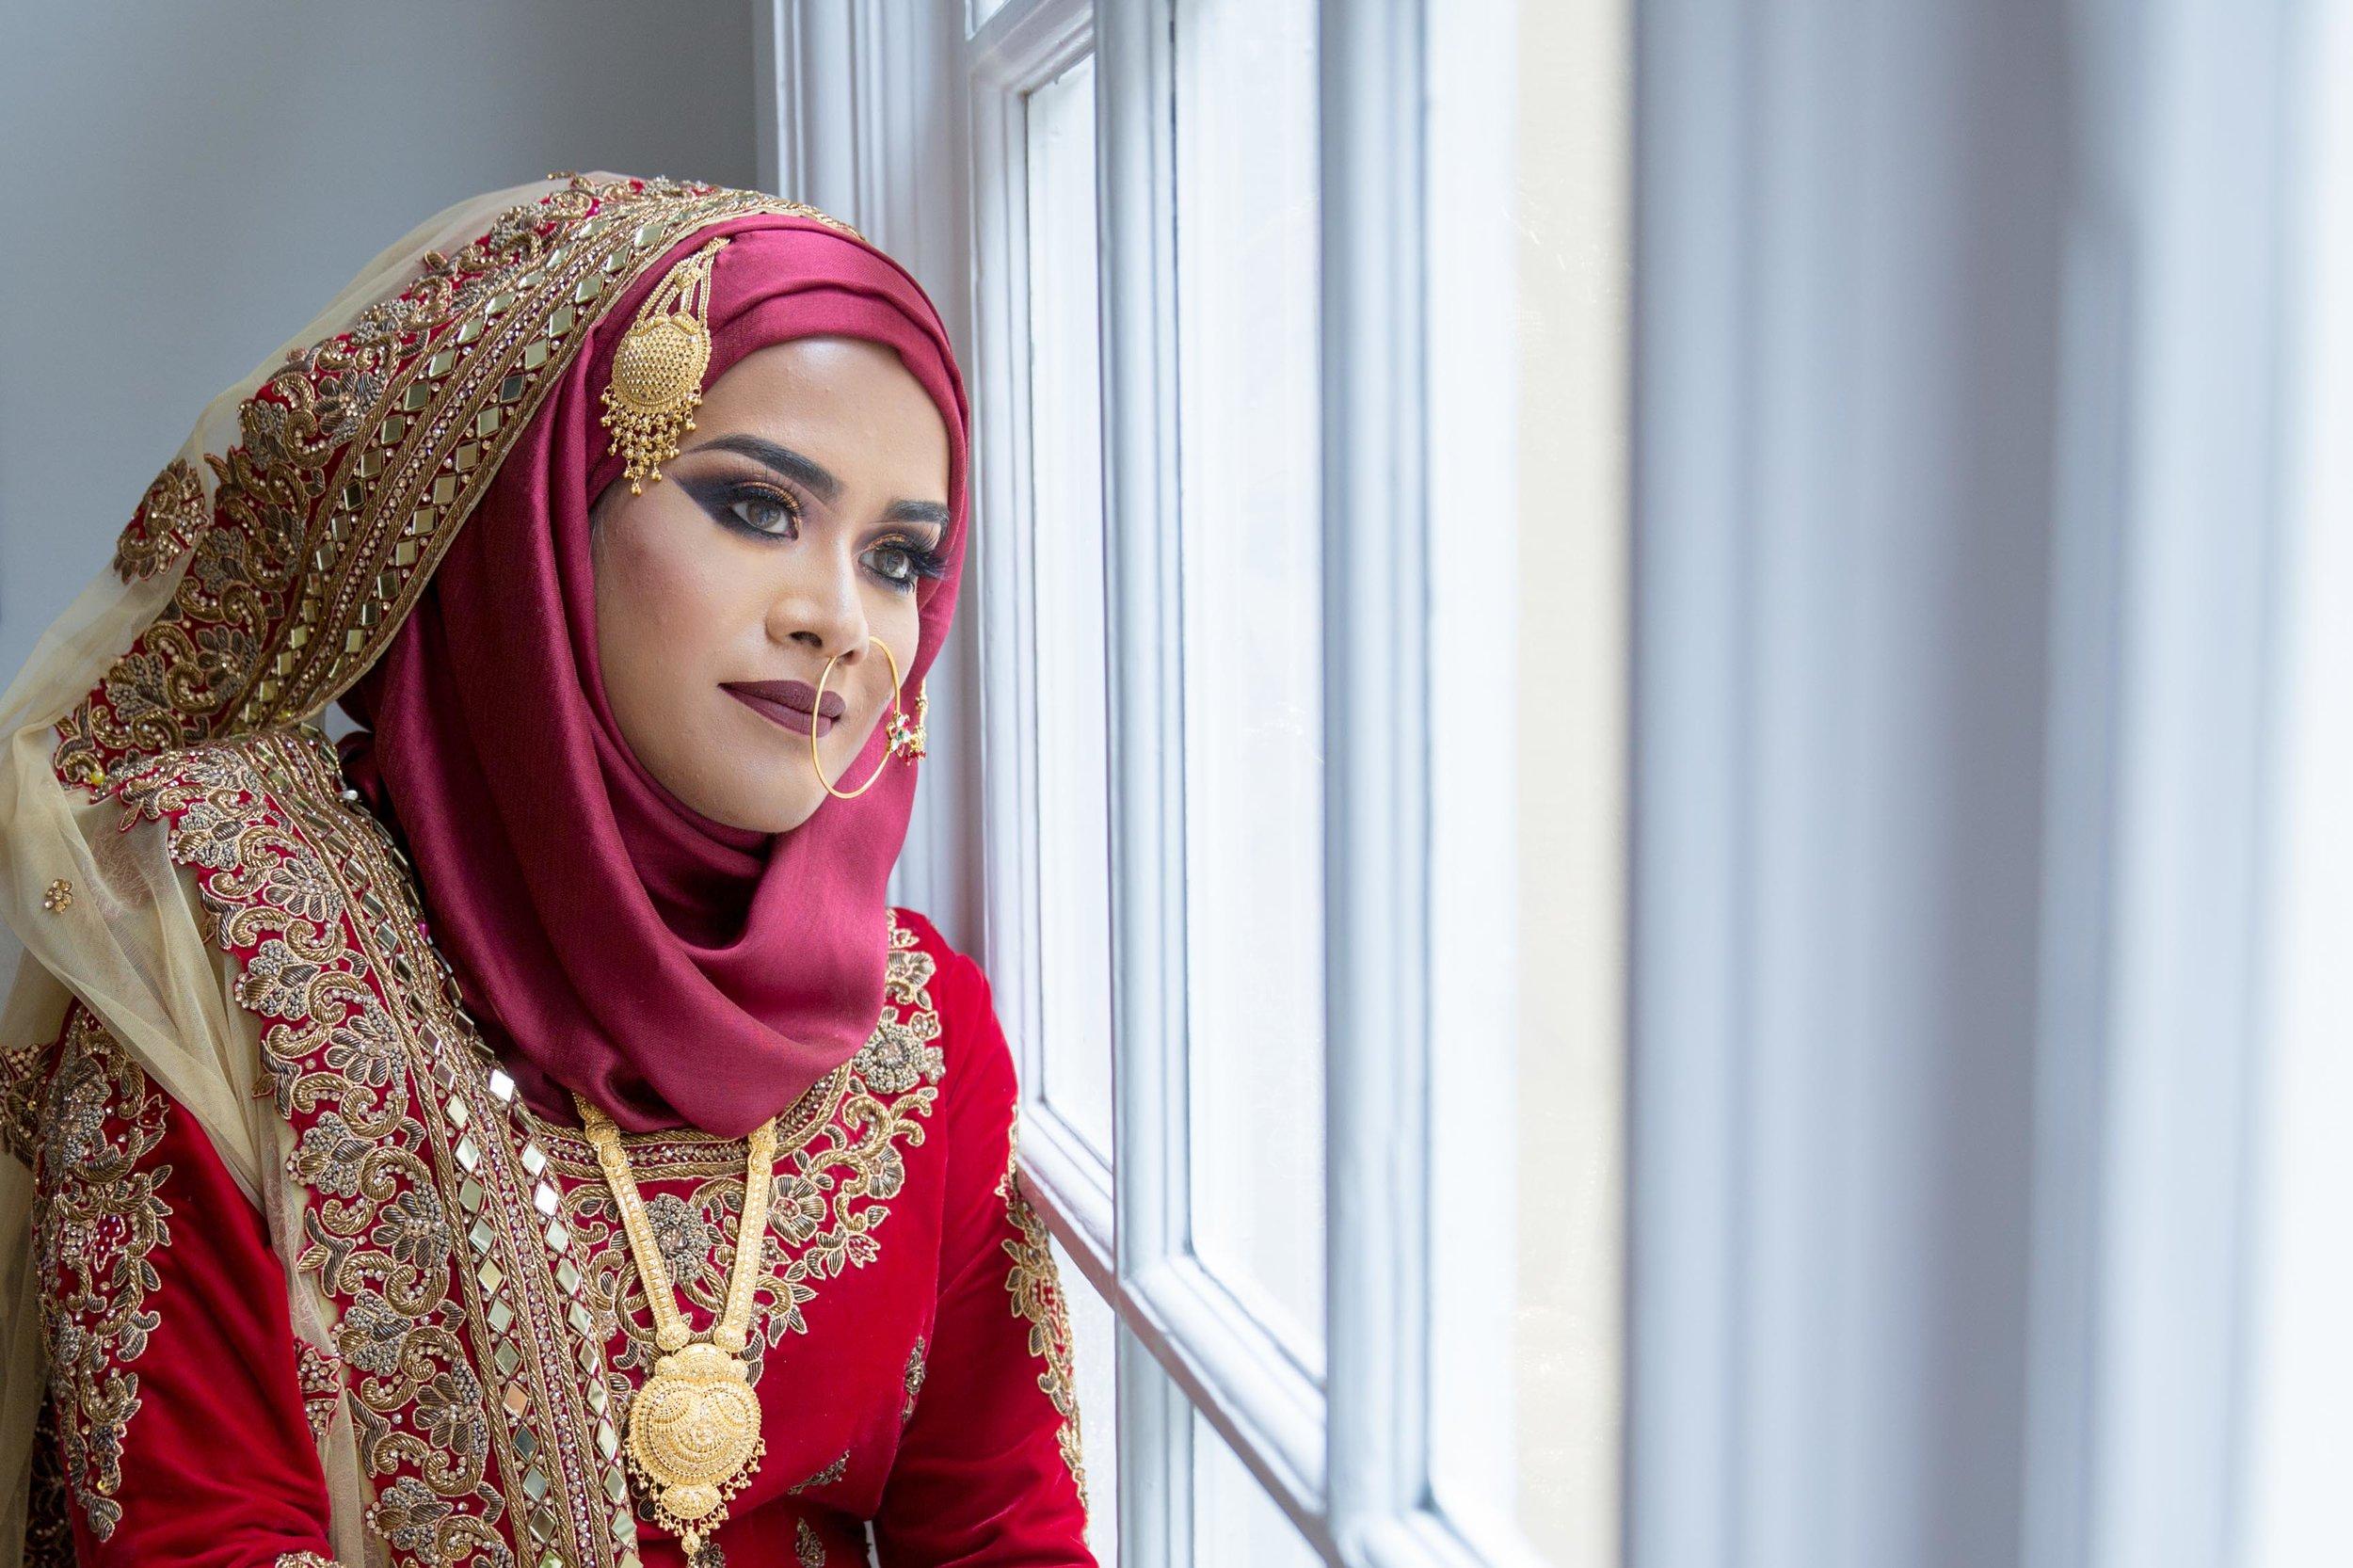 Female-wedding-photographer-bristol-mercure-bristol-grand-hotel-natalia-smith-photography-1.jpg